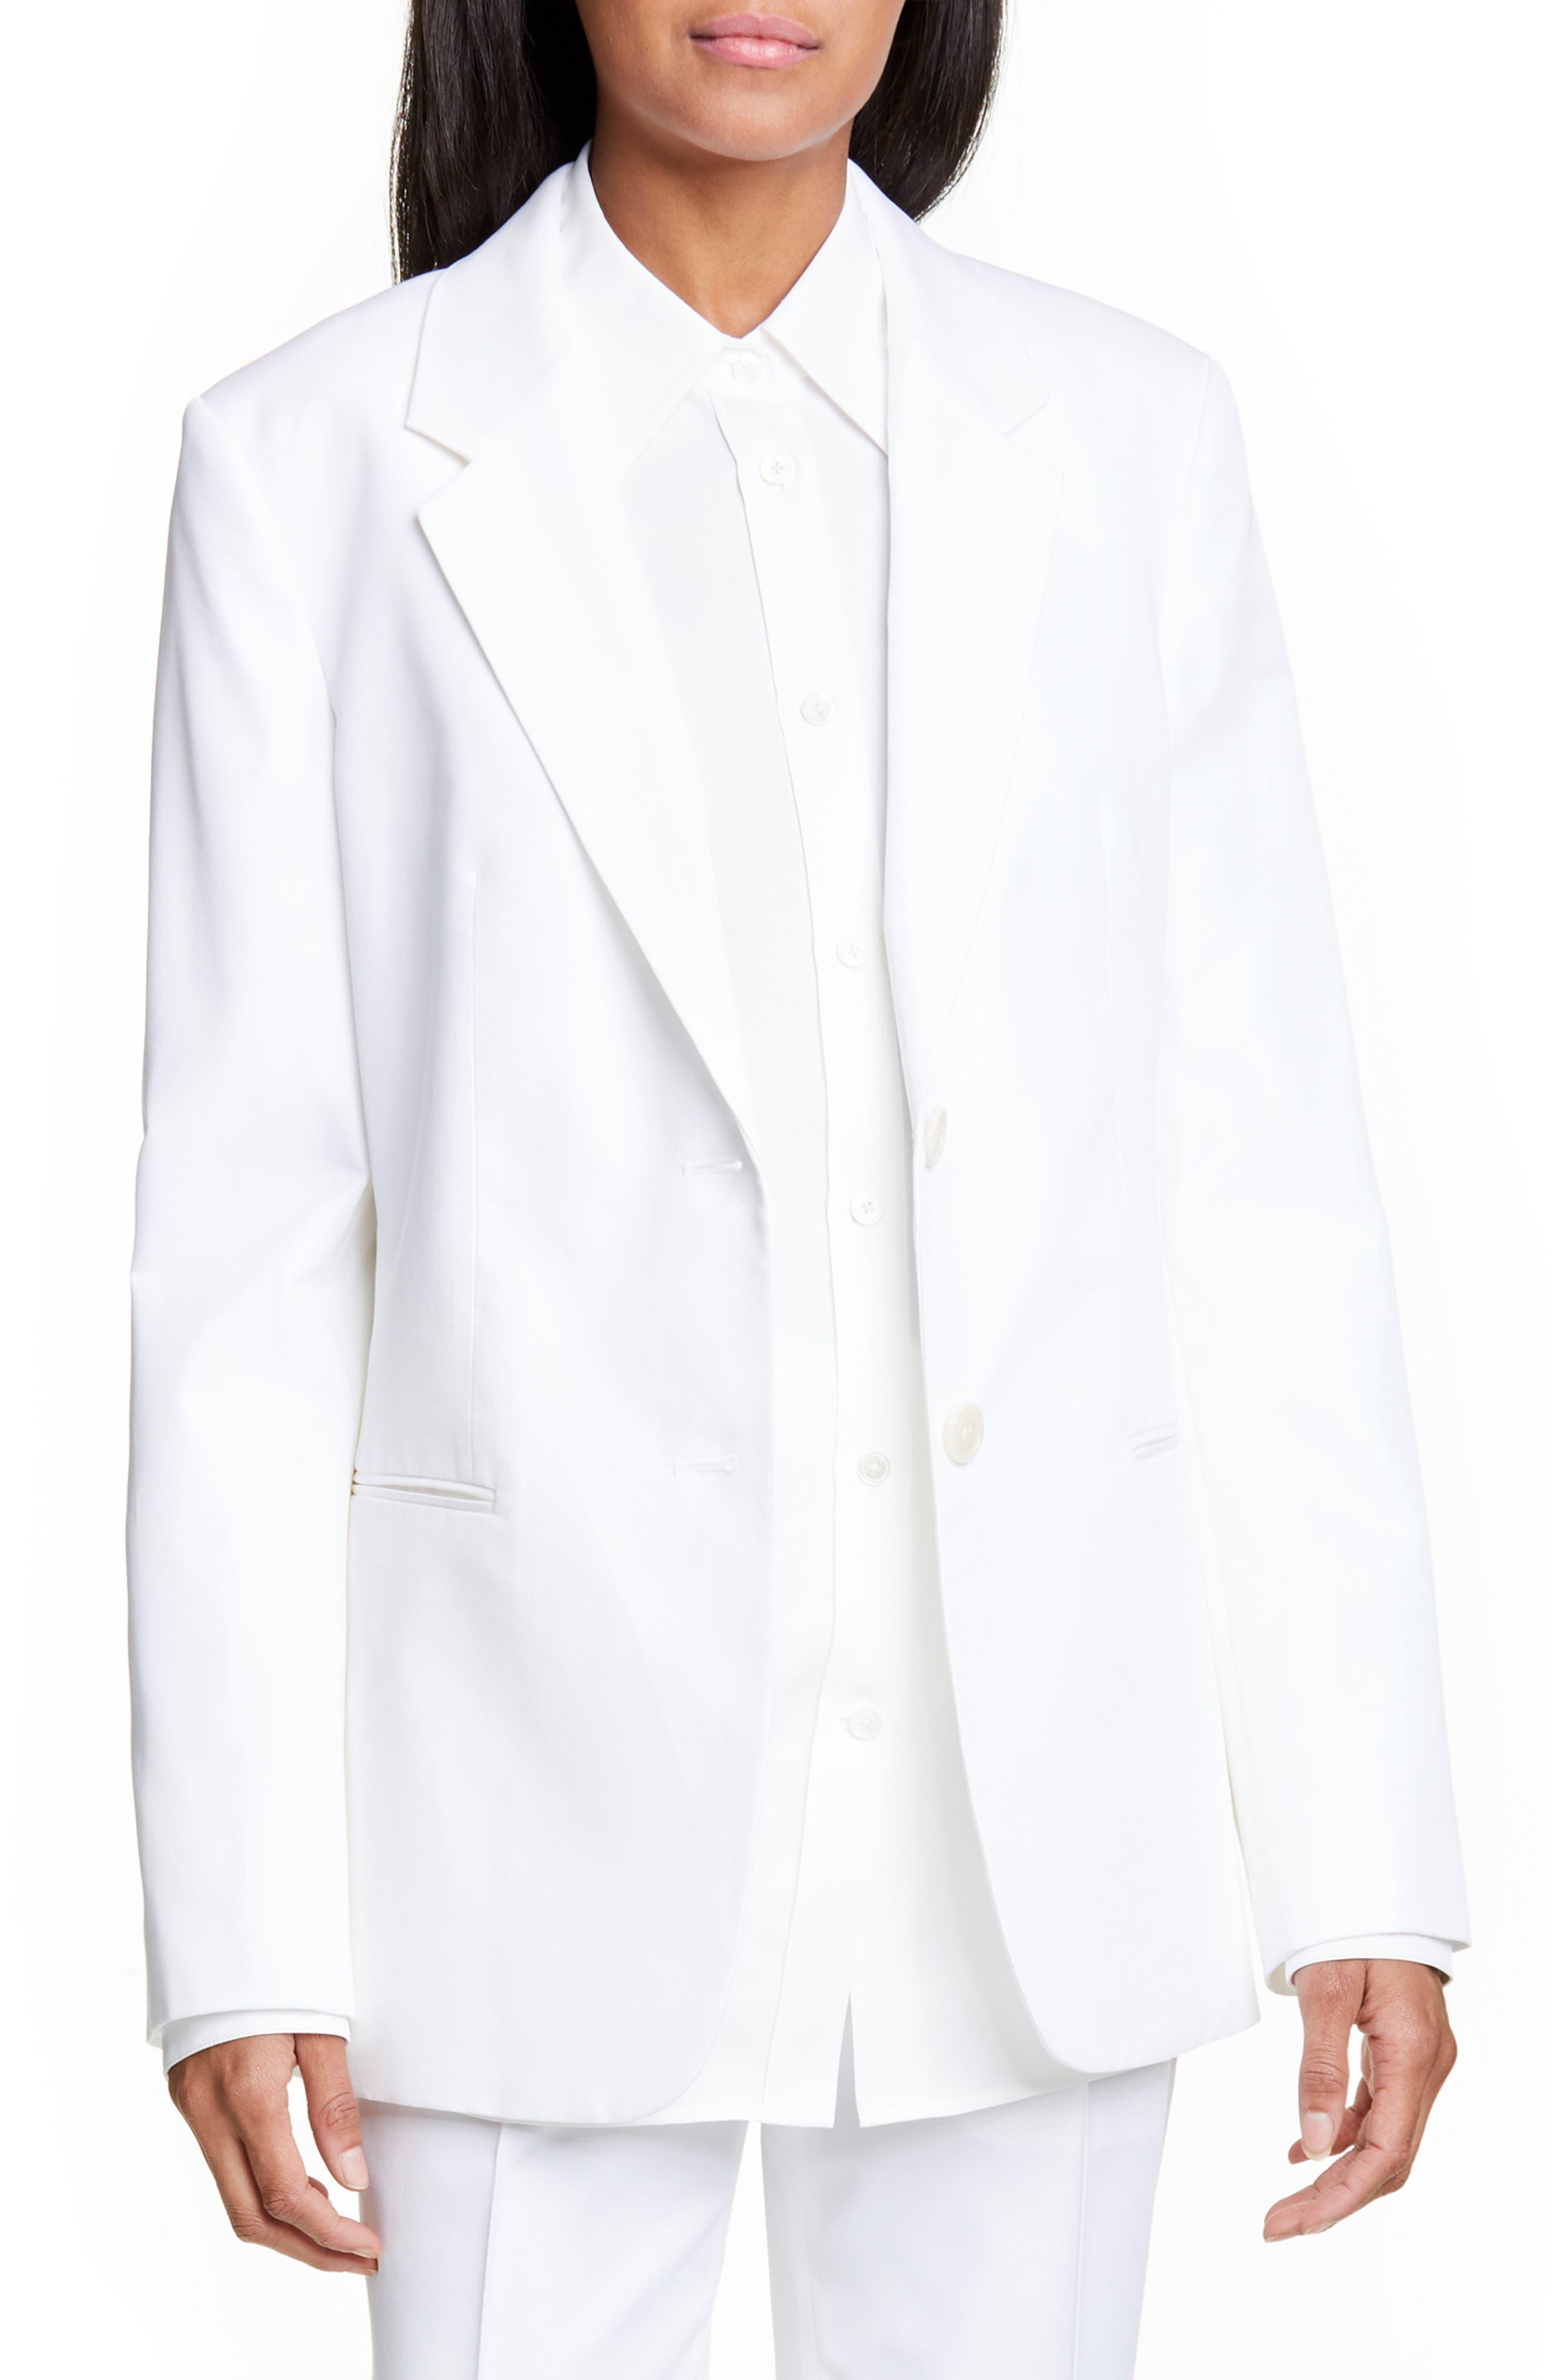 HELMUT LANG, Cotton Blend Blazer, Main thumbnail 1, color, WHITE